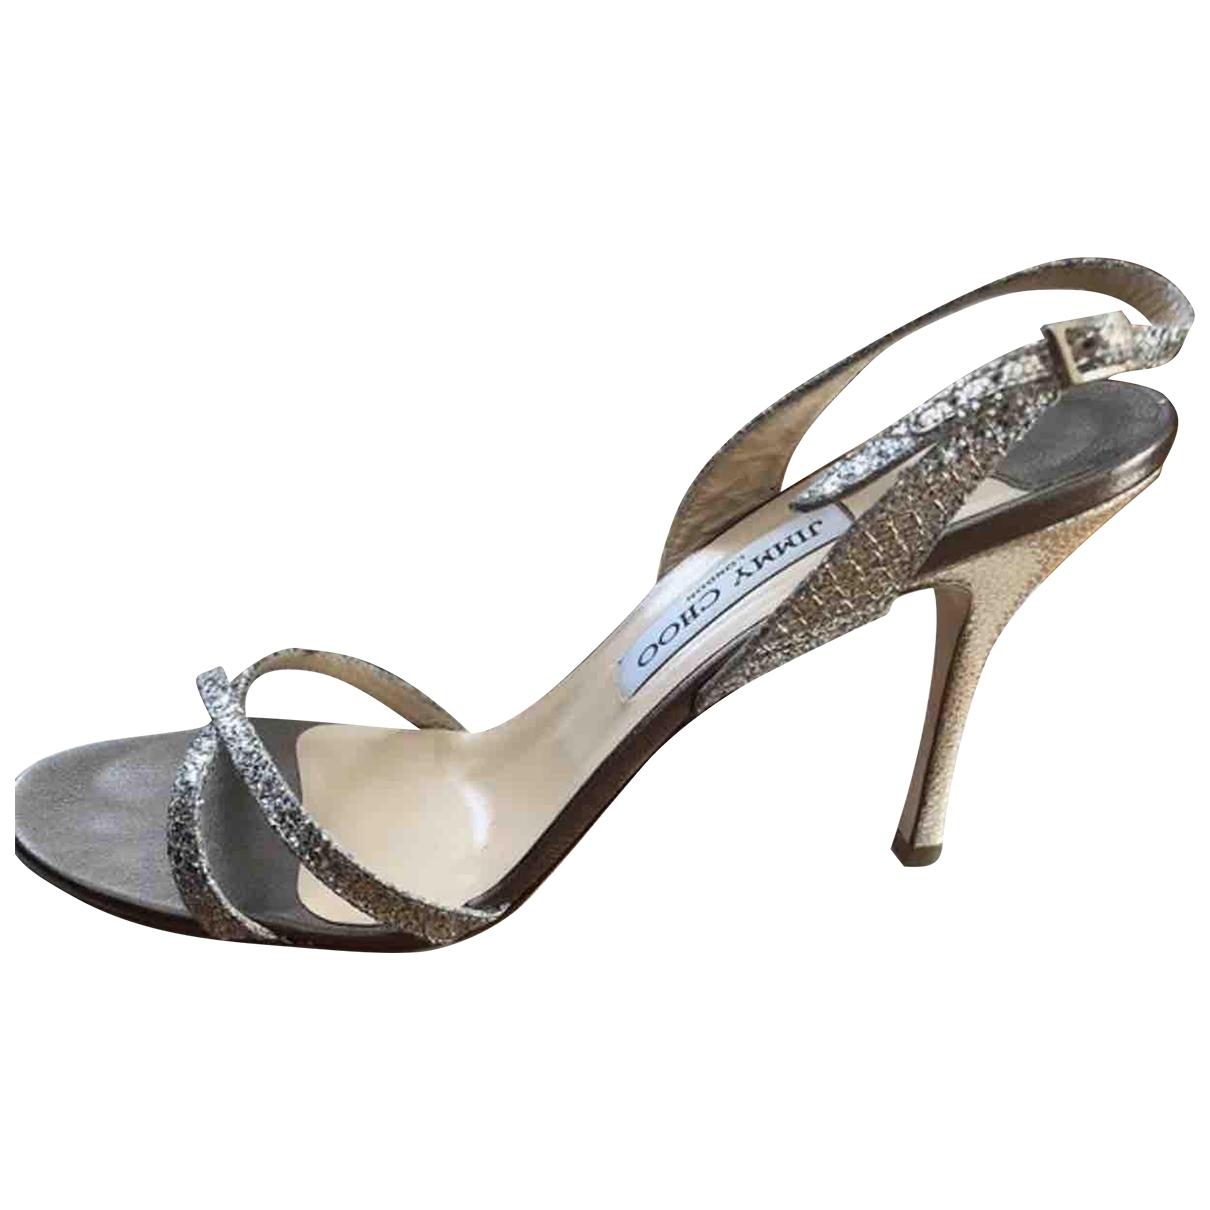 Jimmy Choo \N Silver Leather Sandals for Women 42 IT